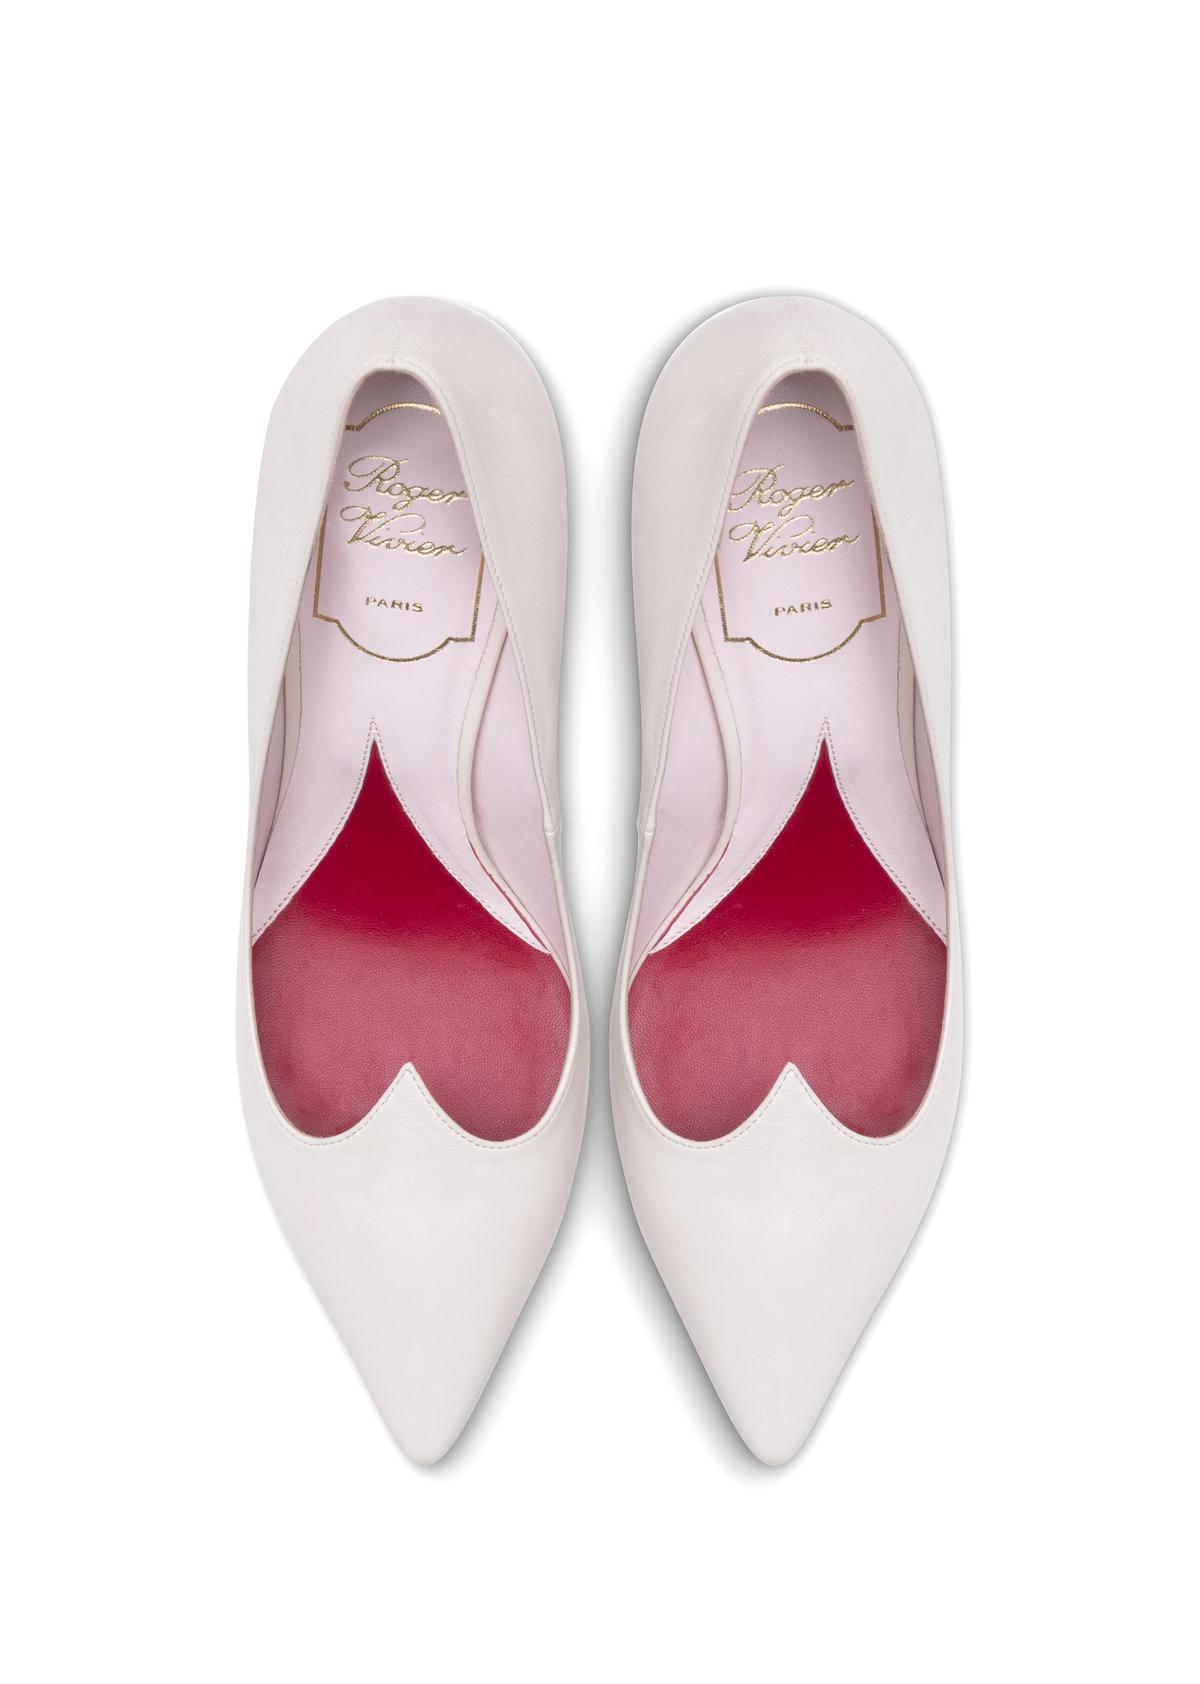 I Love Vivier鞋底的愛心,是設計的細節、也是品牌的小心機。(Roger Vivier提供)